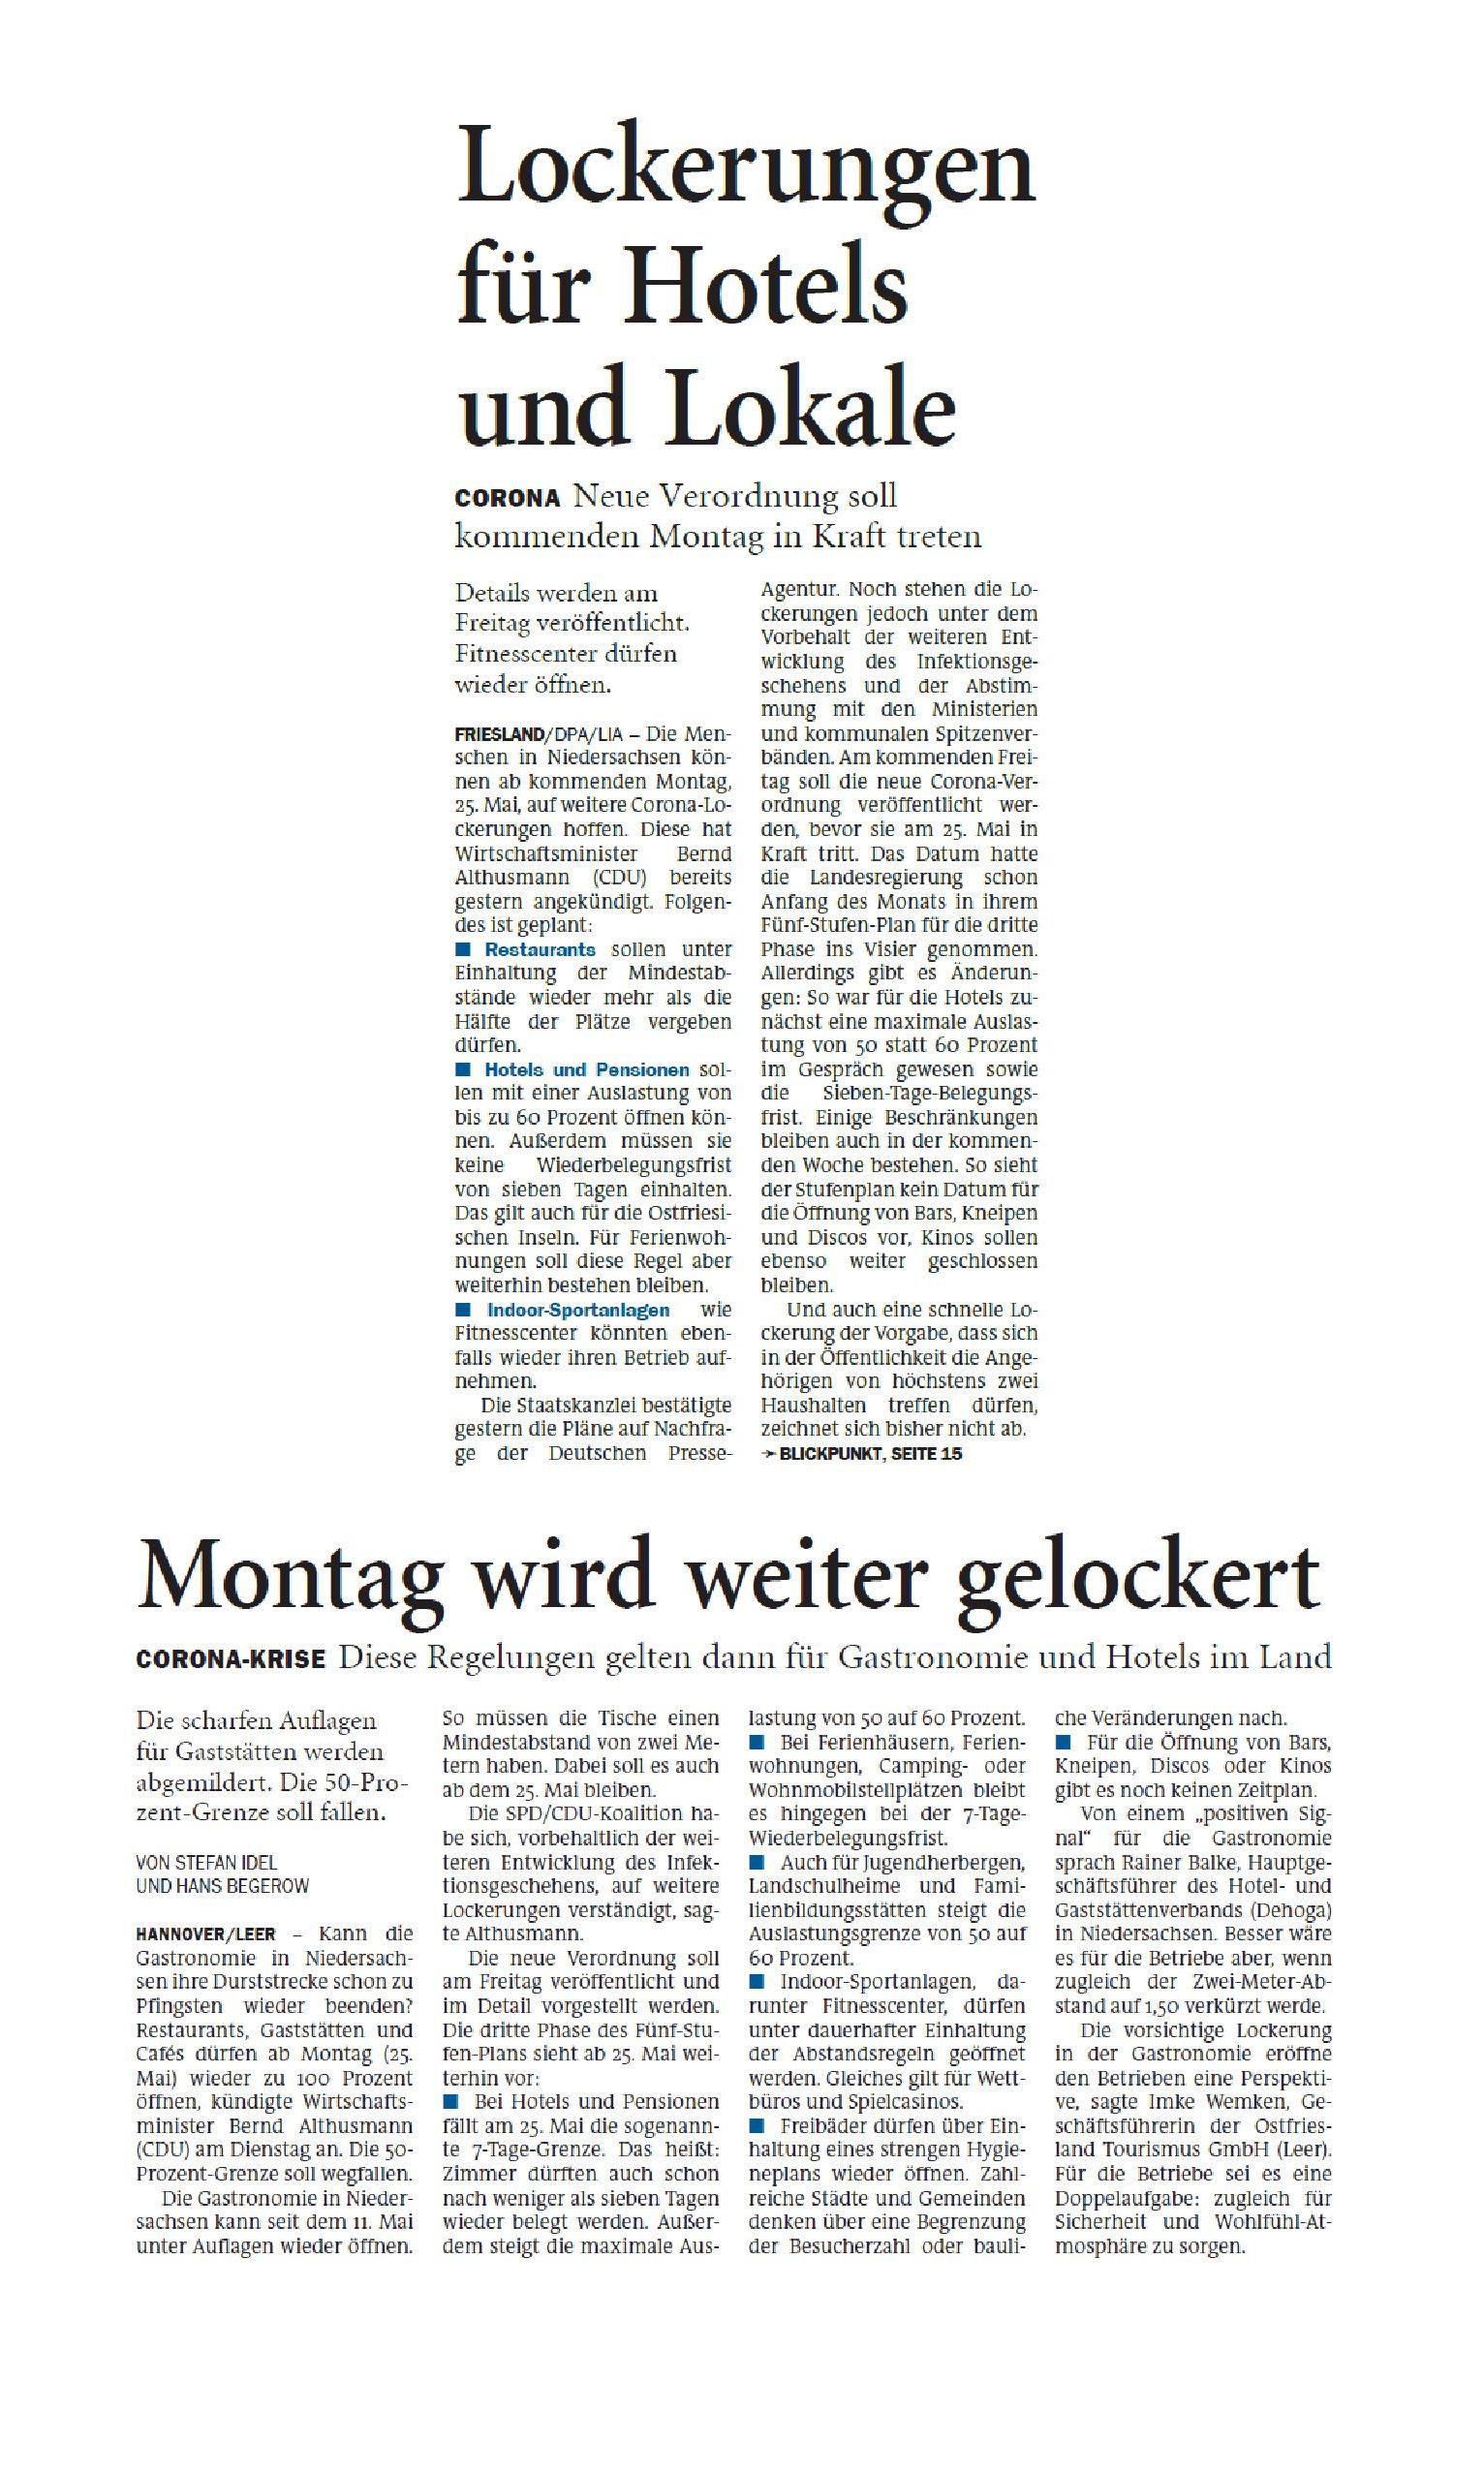 Jeversches Wochenblatt 20.05.2020 III